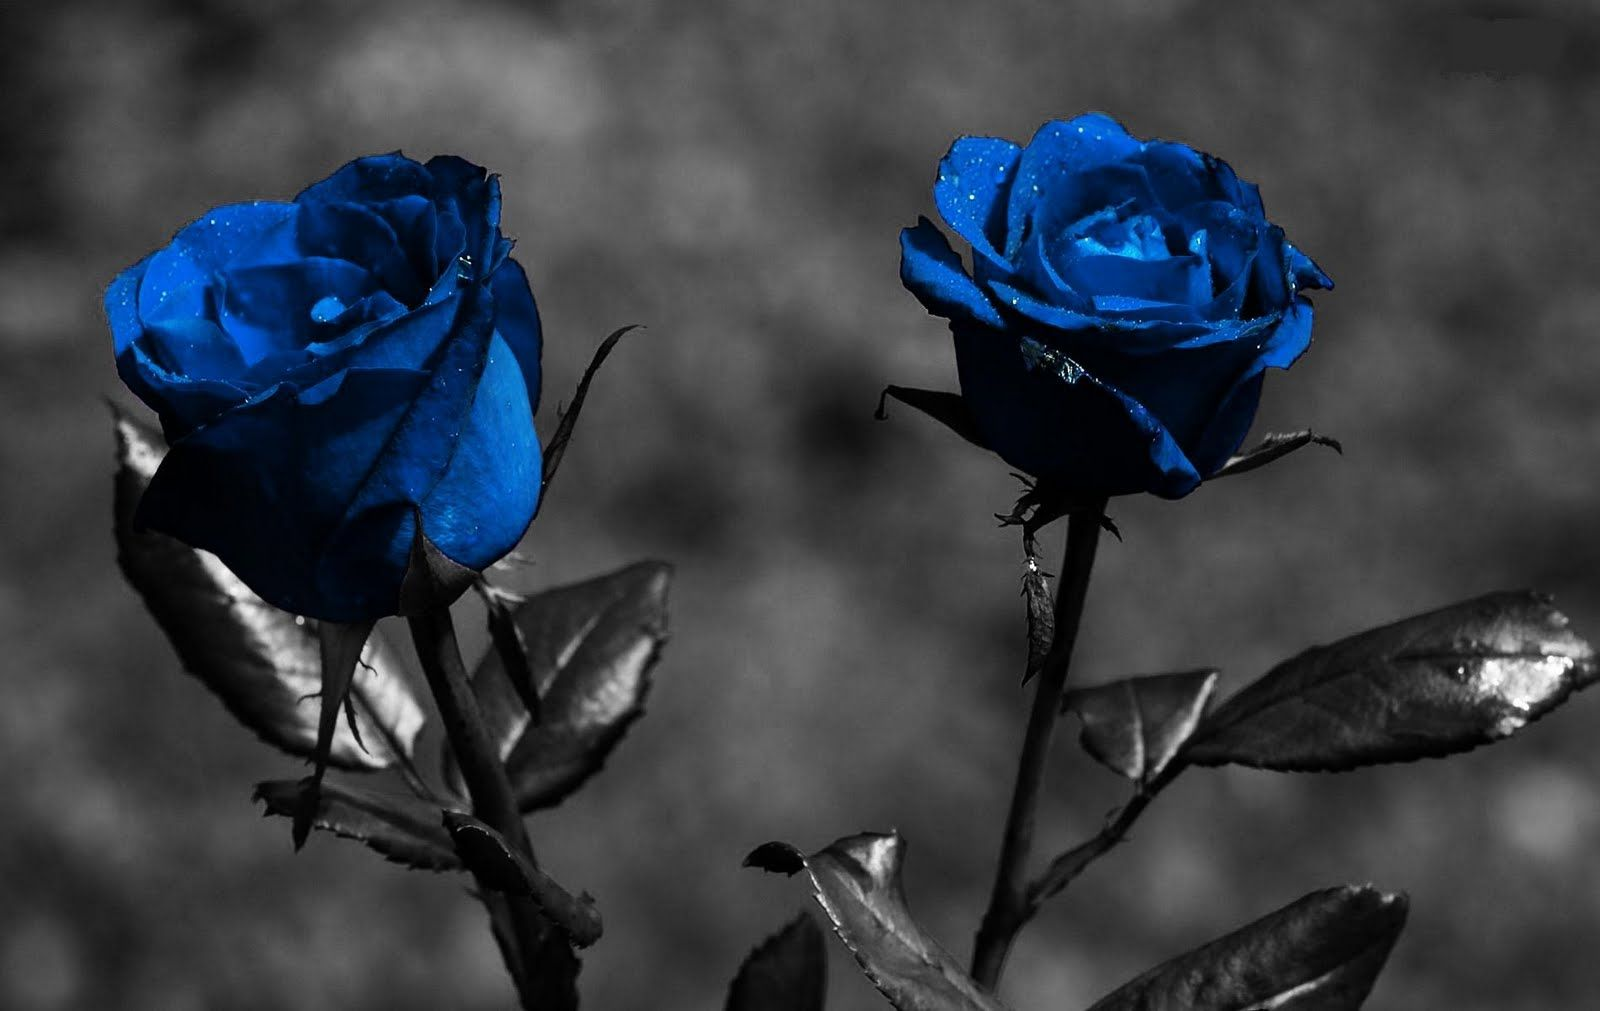 Rosa azul con negro